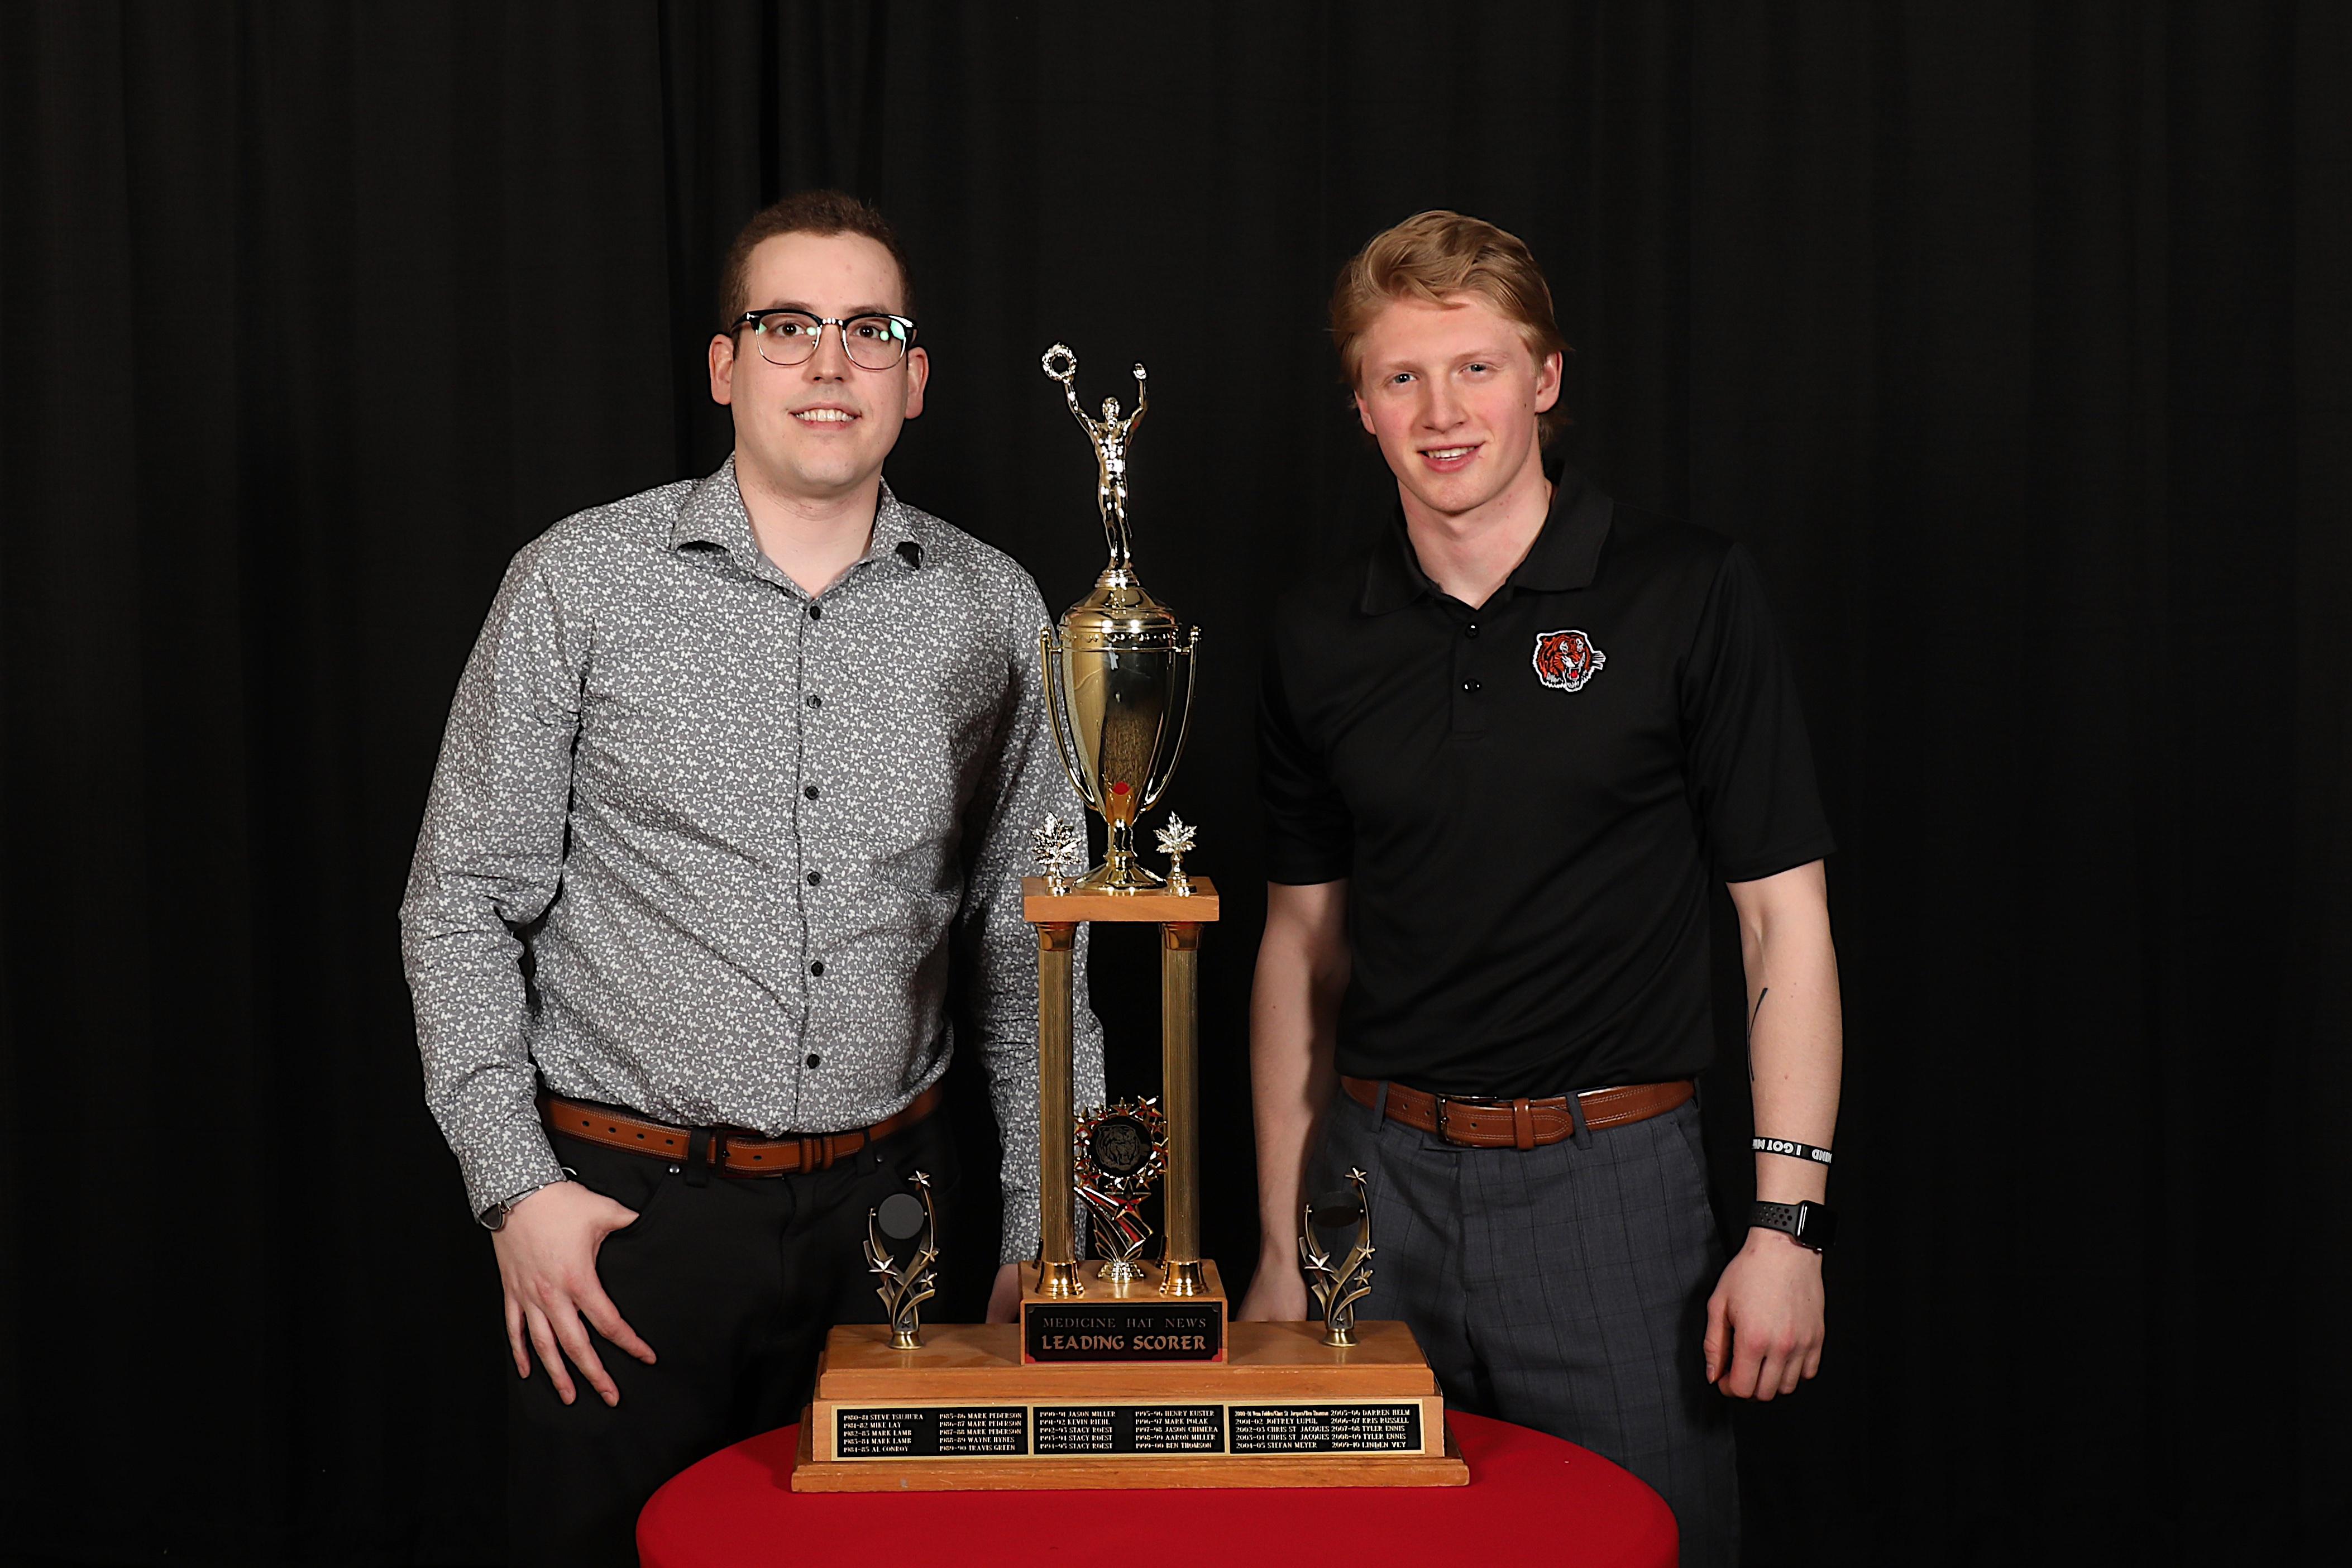 Ryan McCracken of the Medicine Hat News presents the Medicine Hat News Leading Scorer Award to James Hamblin